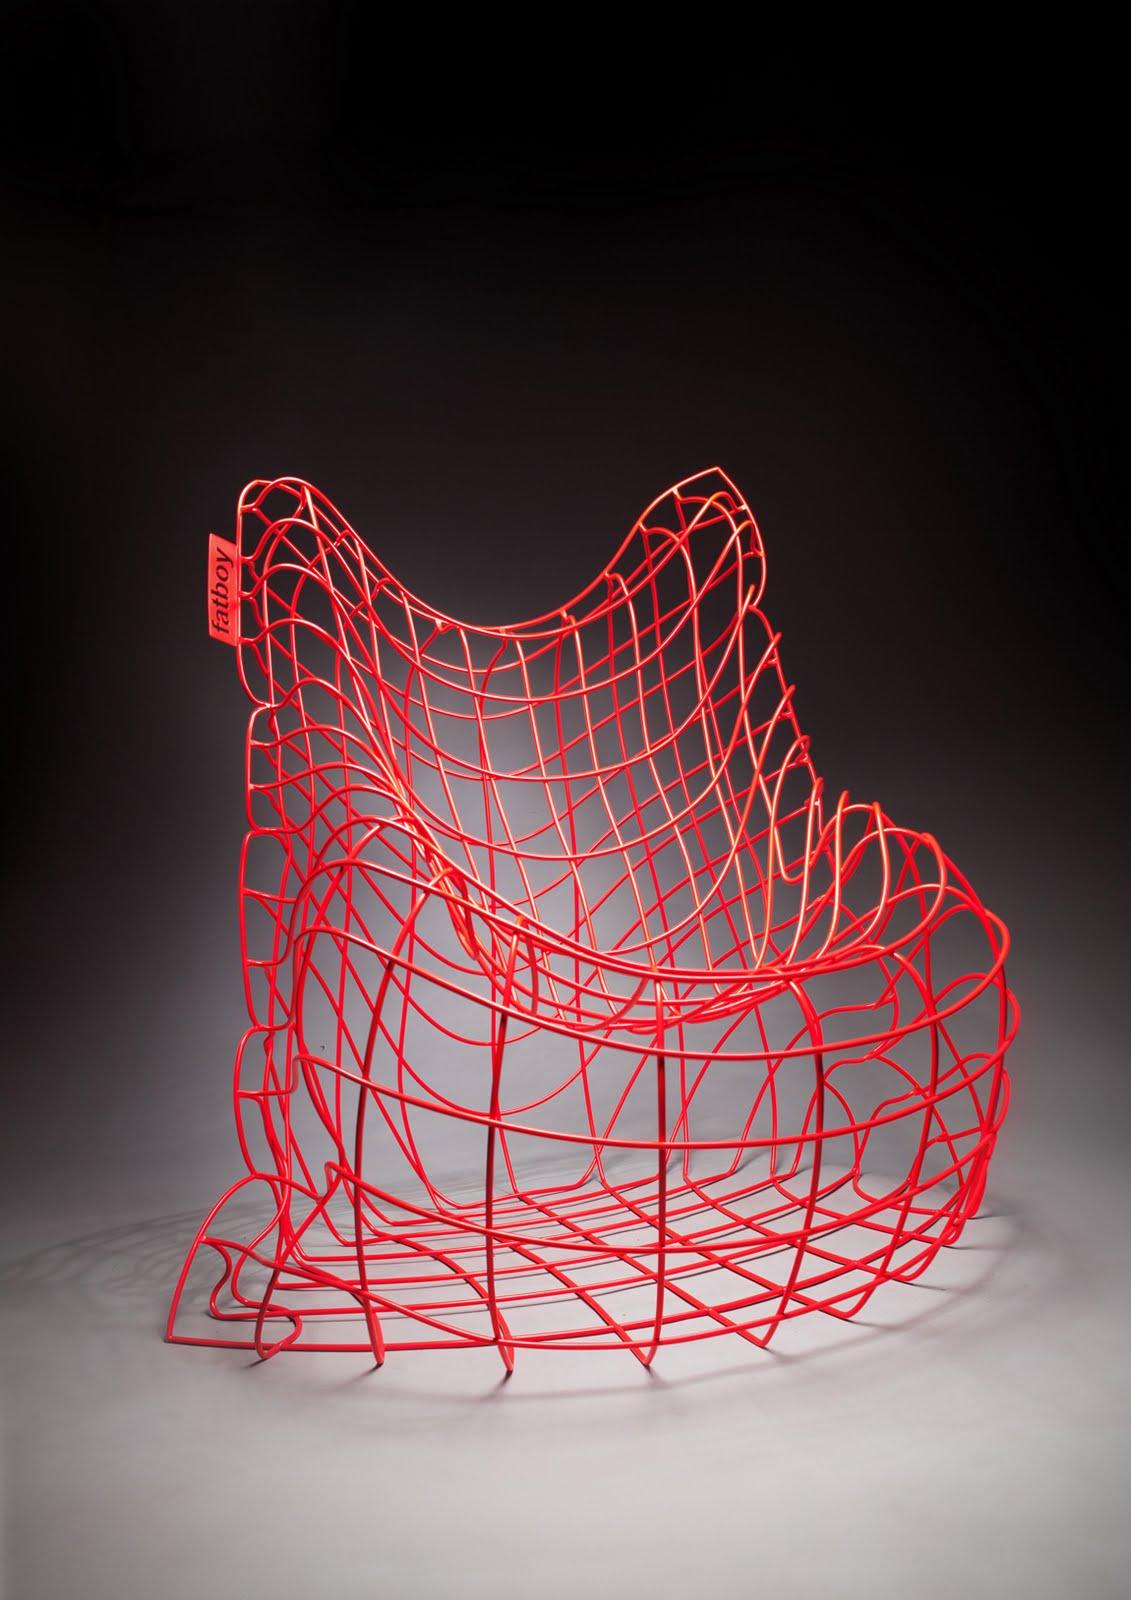 Wobble Chair Research Corner For Bedroom No End To Design Salone Internazionale Del Mobile 2011